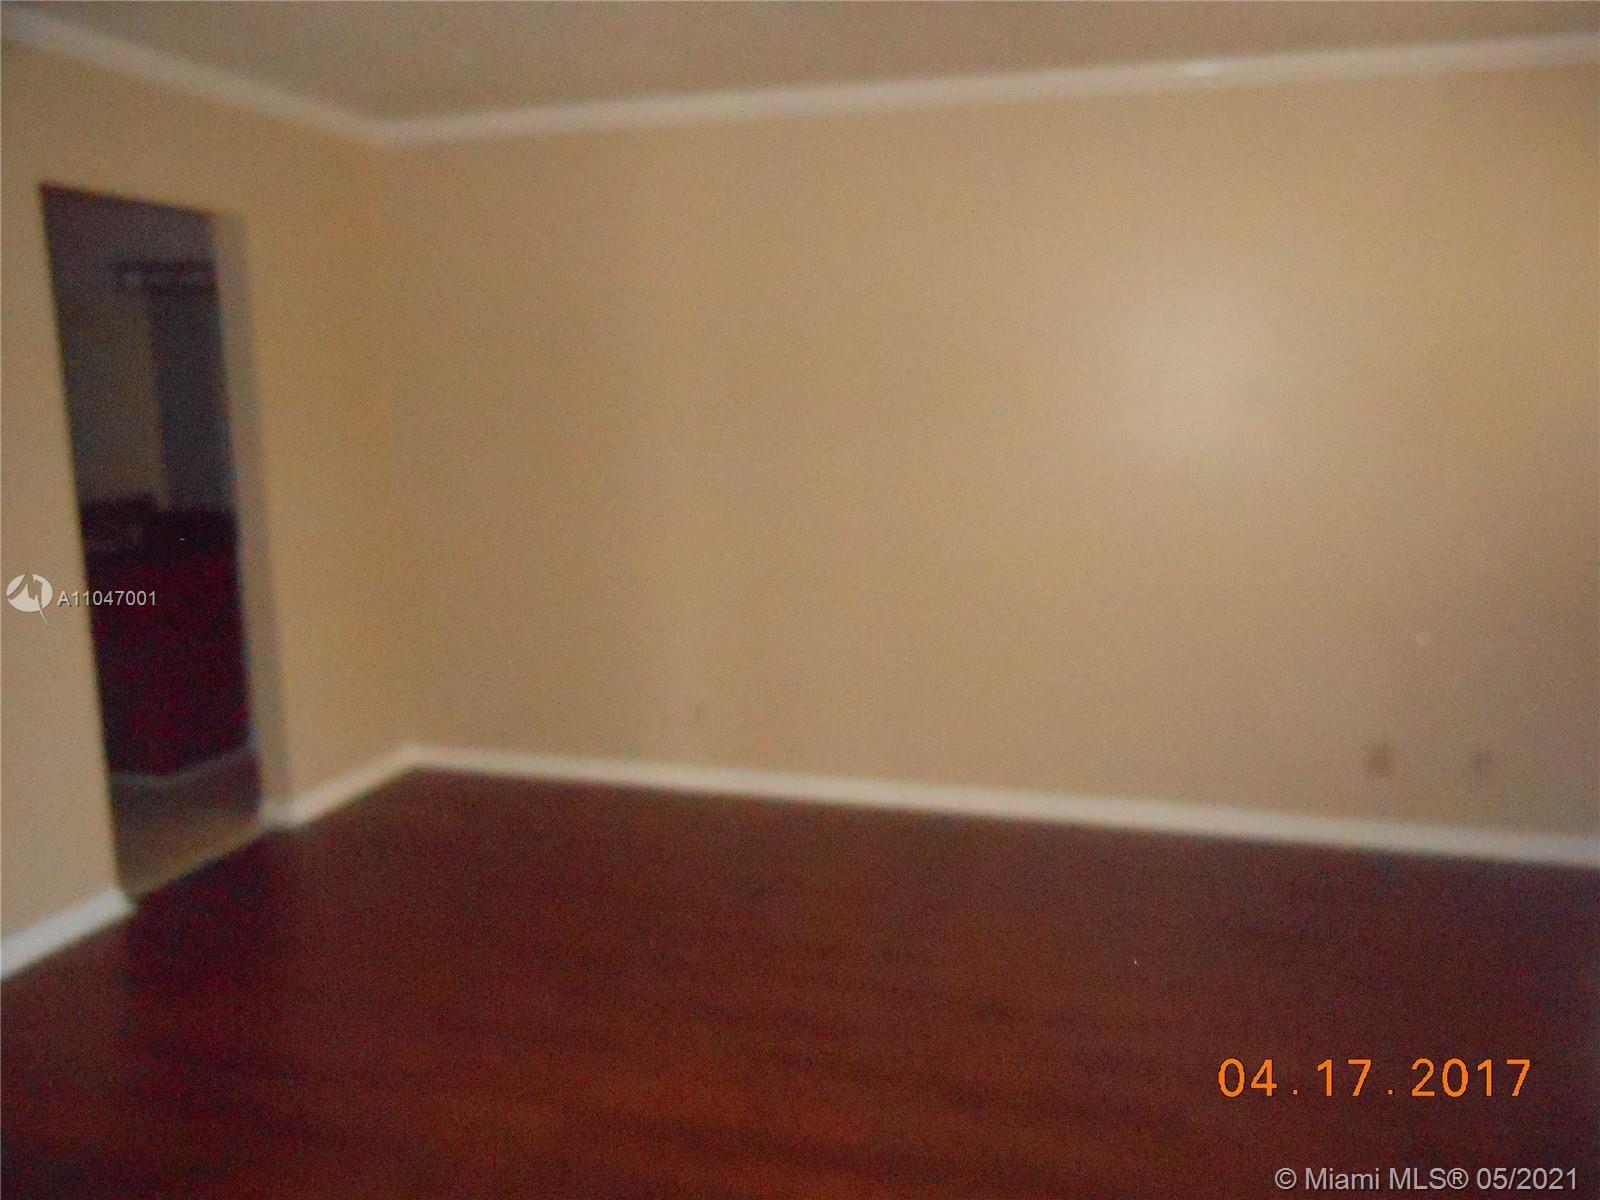 6475 W Oakland Park Blvd #110, Lauderhill, FL 33313 - #: A11047001